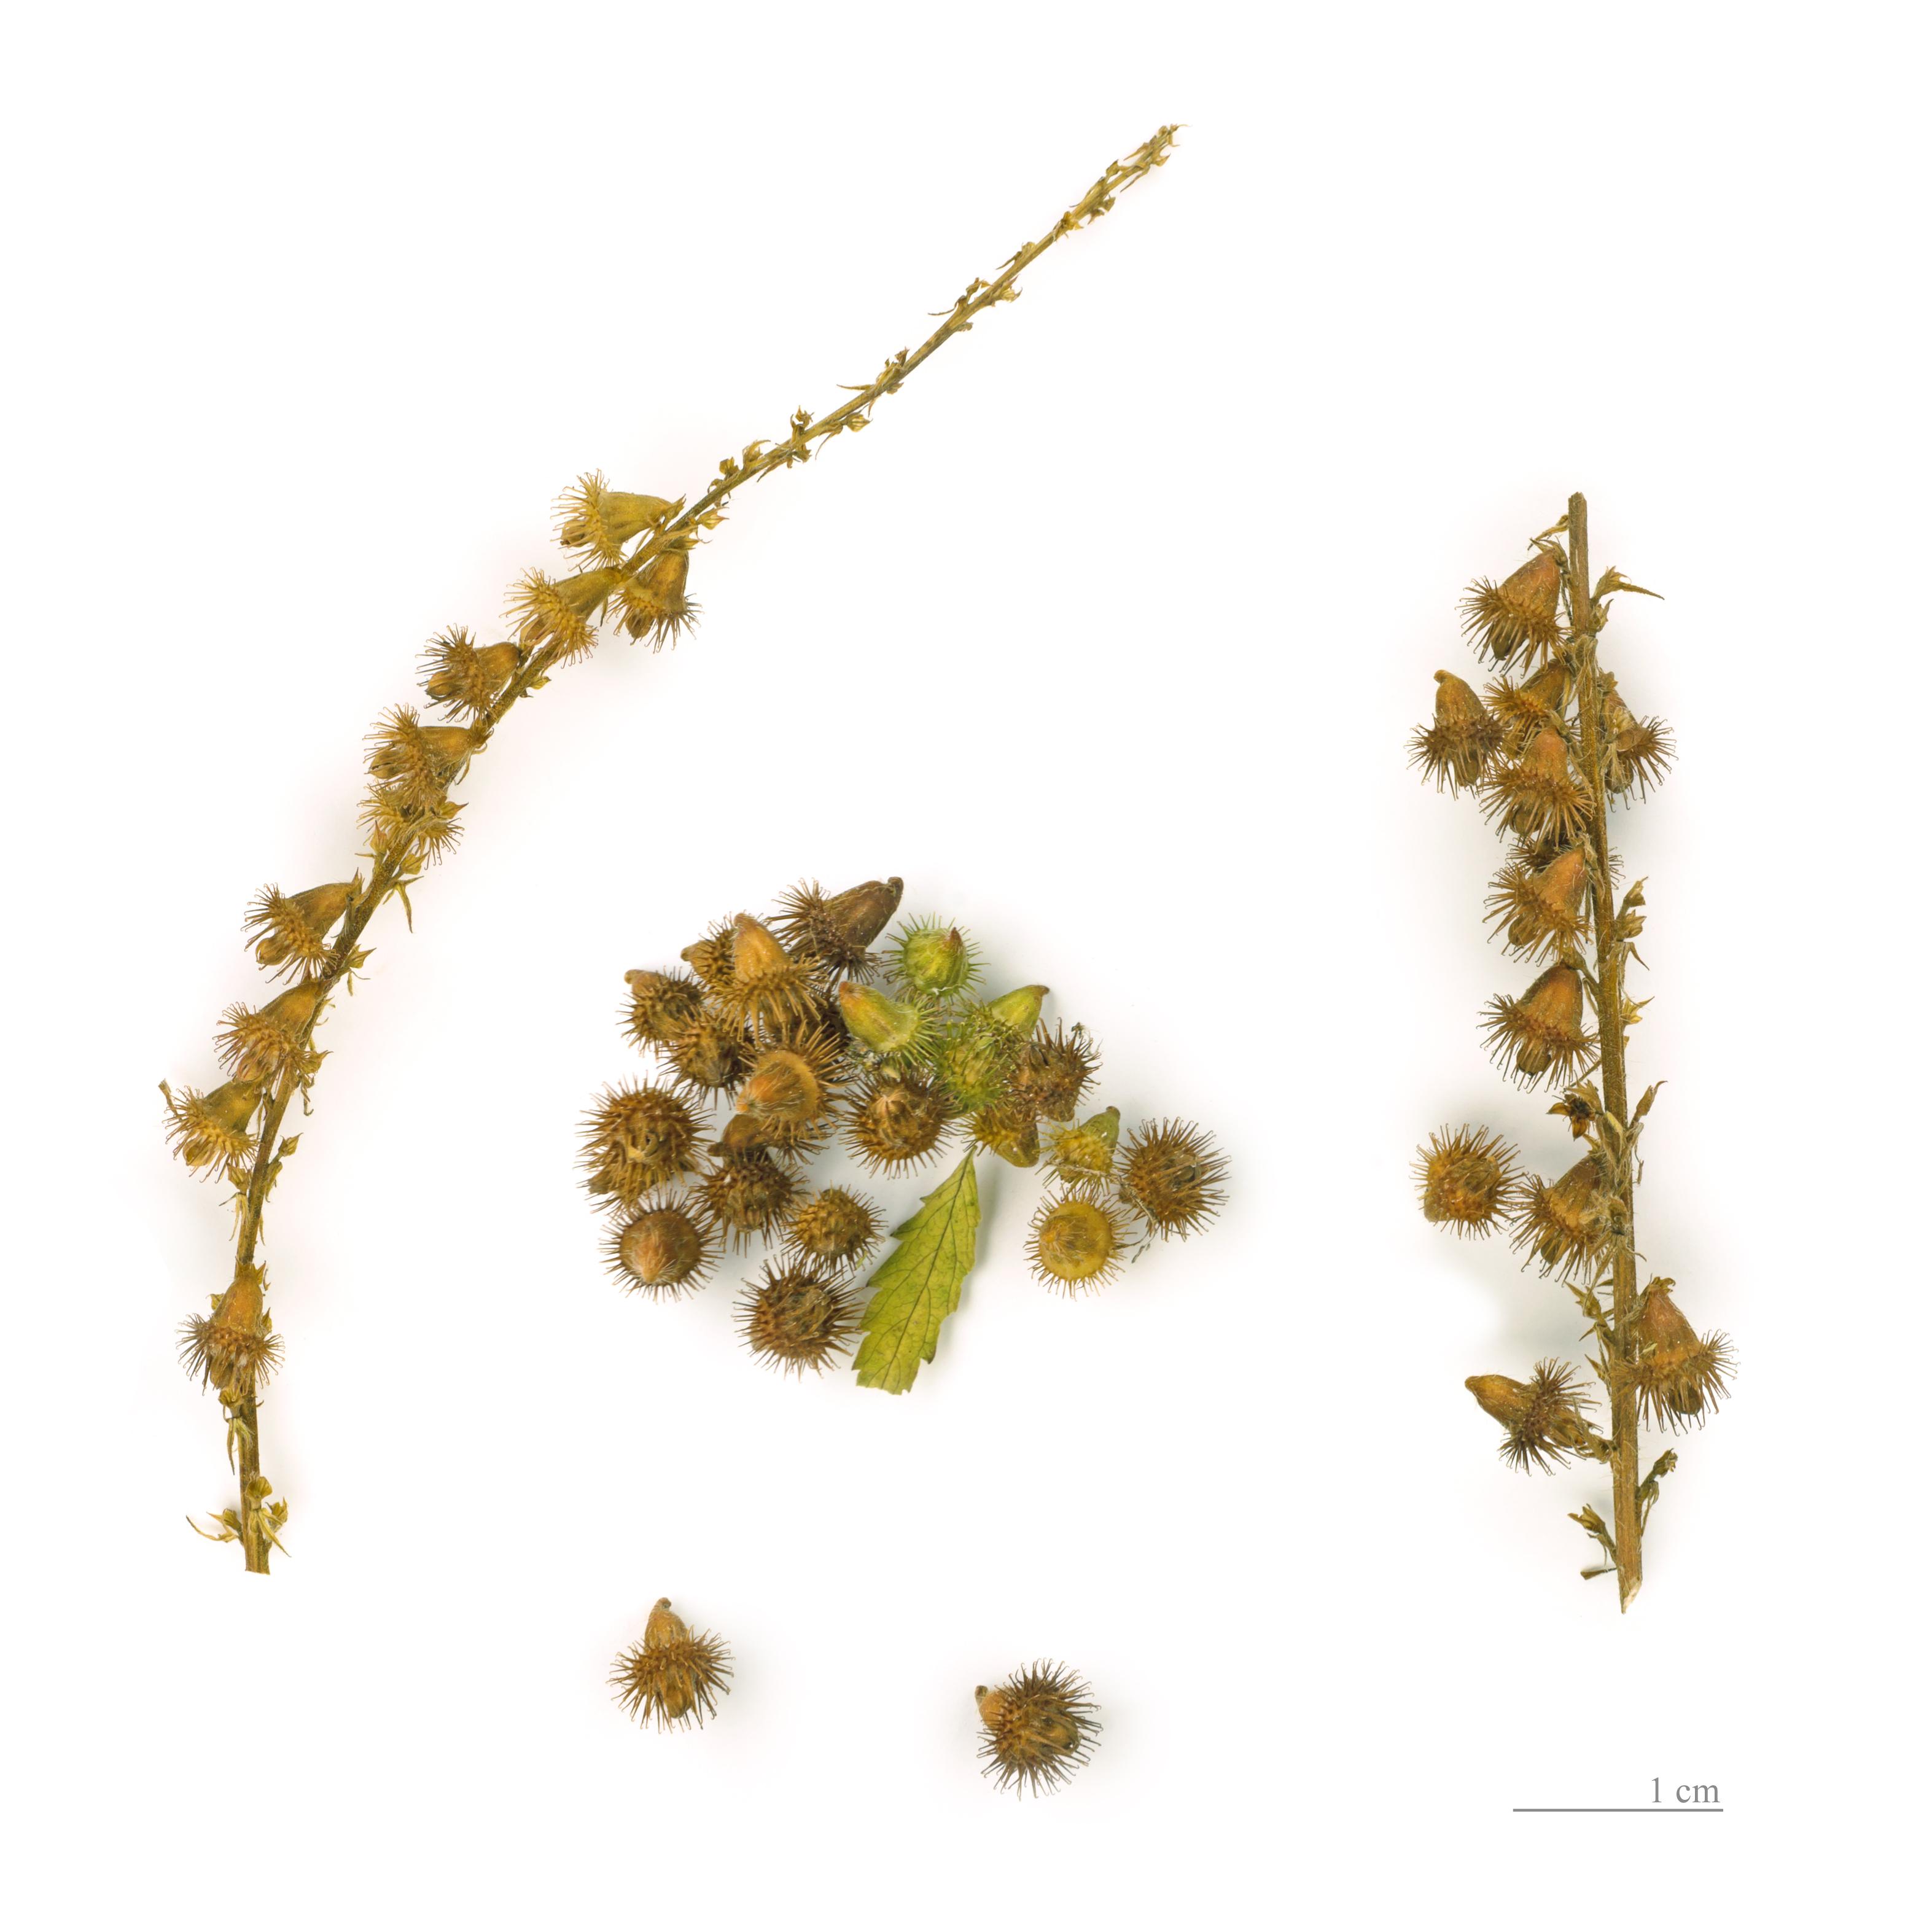 DateiAgrimonia eupatoria MHNT.BOT.220.20.jpg – Wikipedia